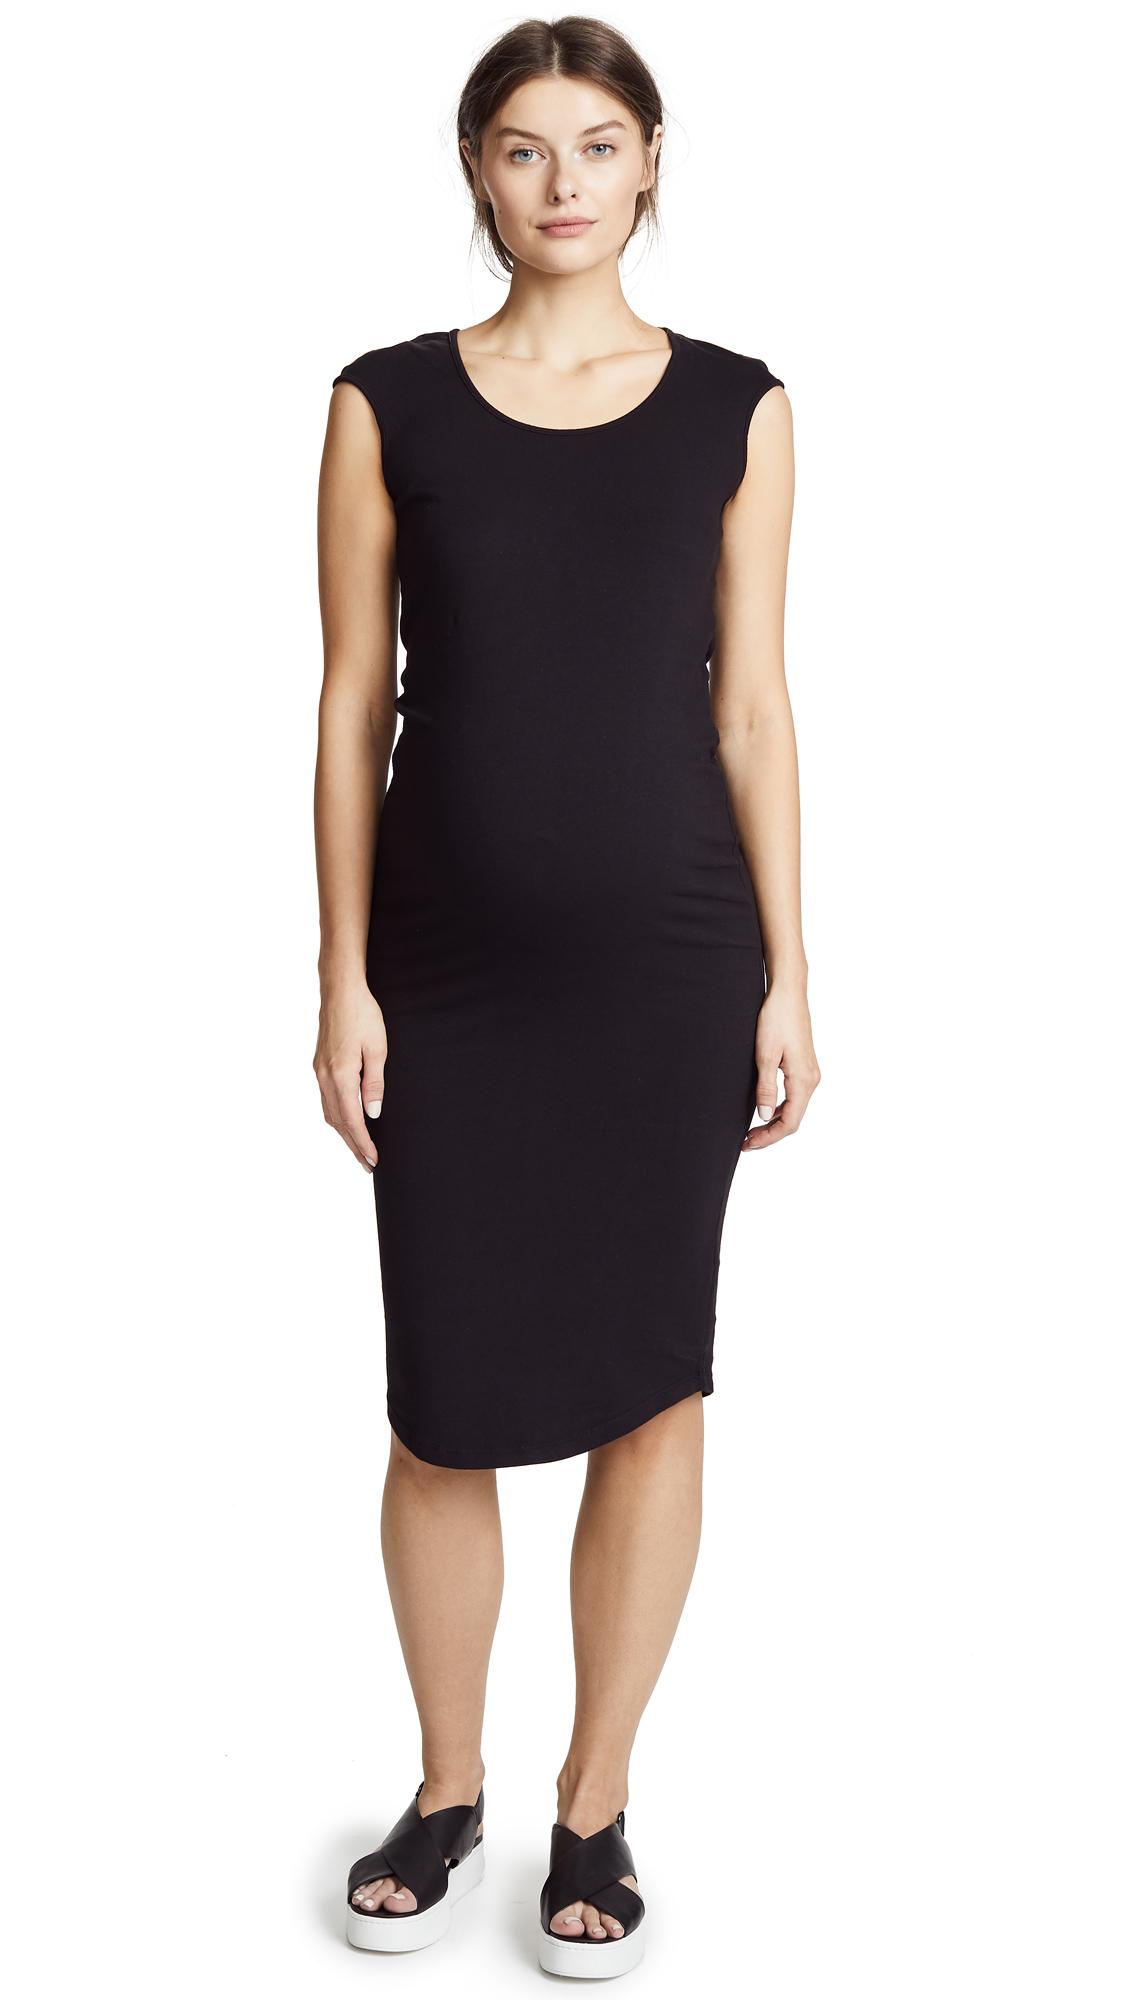 MONROW Maternity Cap Sleeve Dress In Black